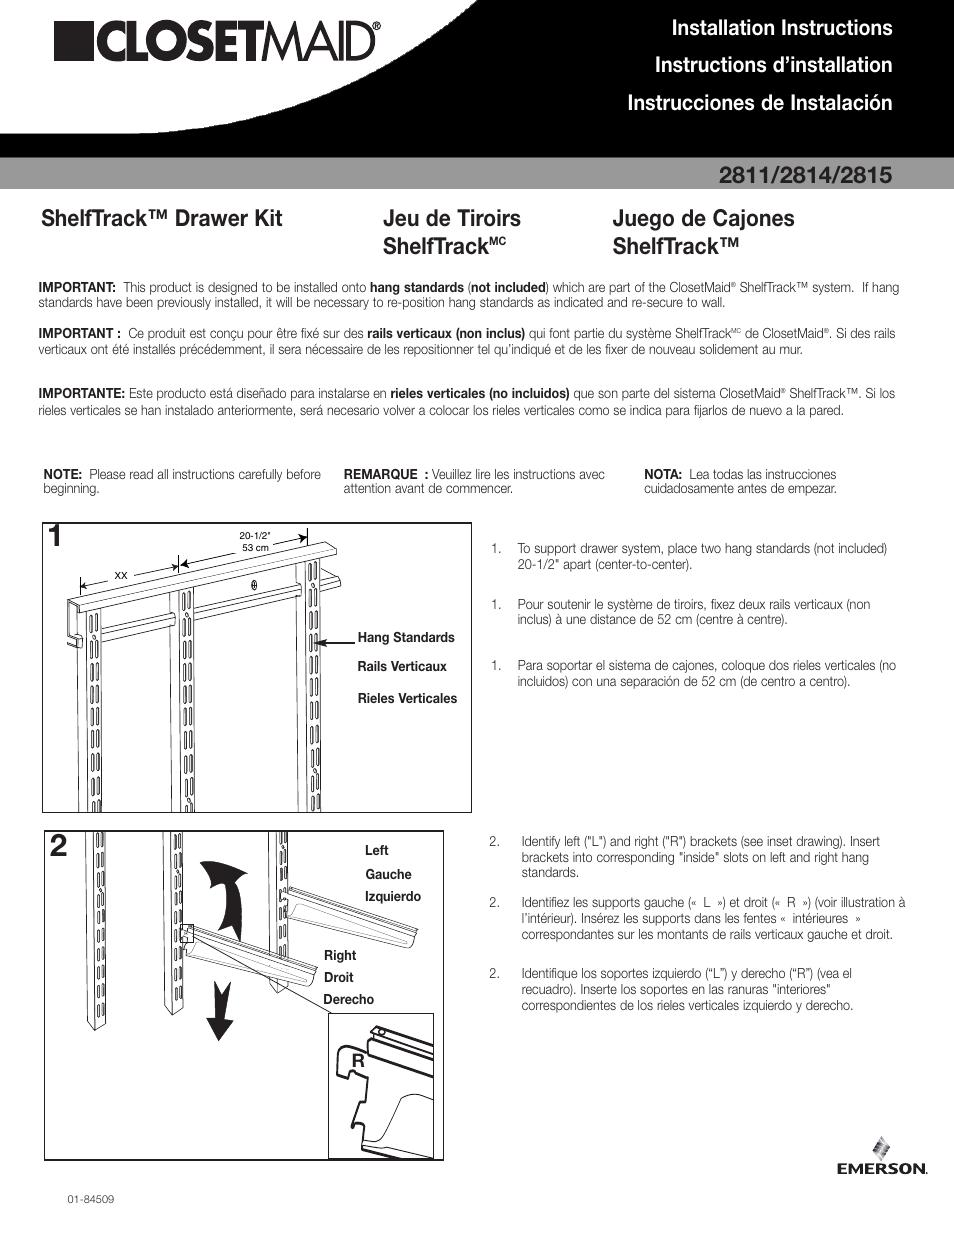 Closet Maid ShelfTrack Drawer Kit 2811 User Manual | 2 Pages | Also For:  ShelfTrack Drawer Kit 2815, ShelfTrack Drawer Kit 2814